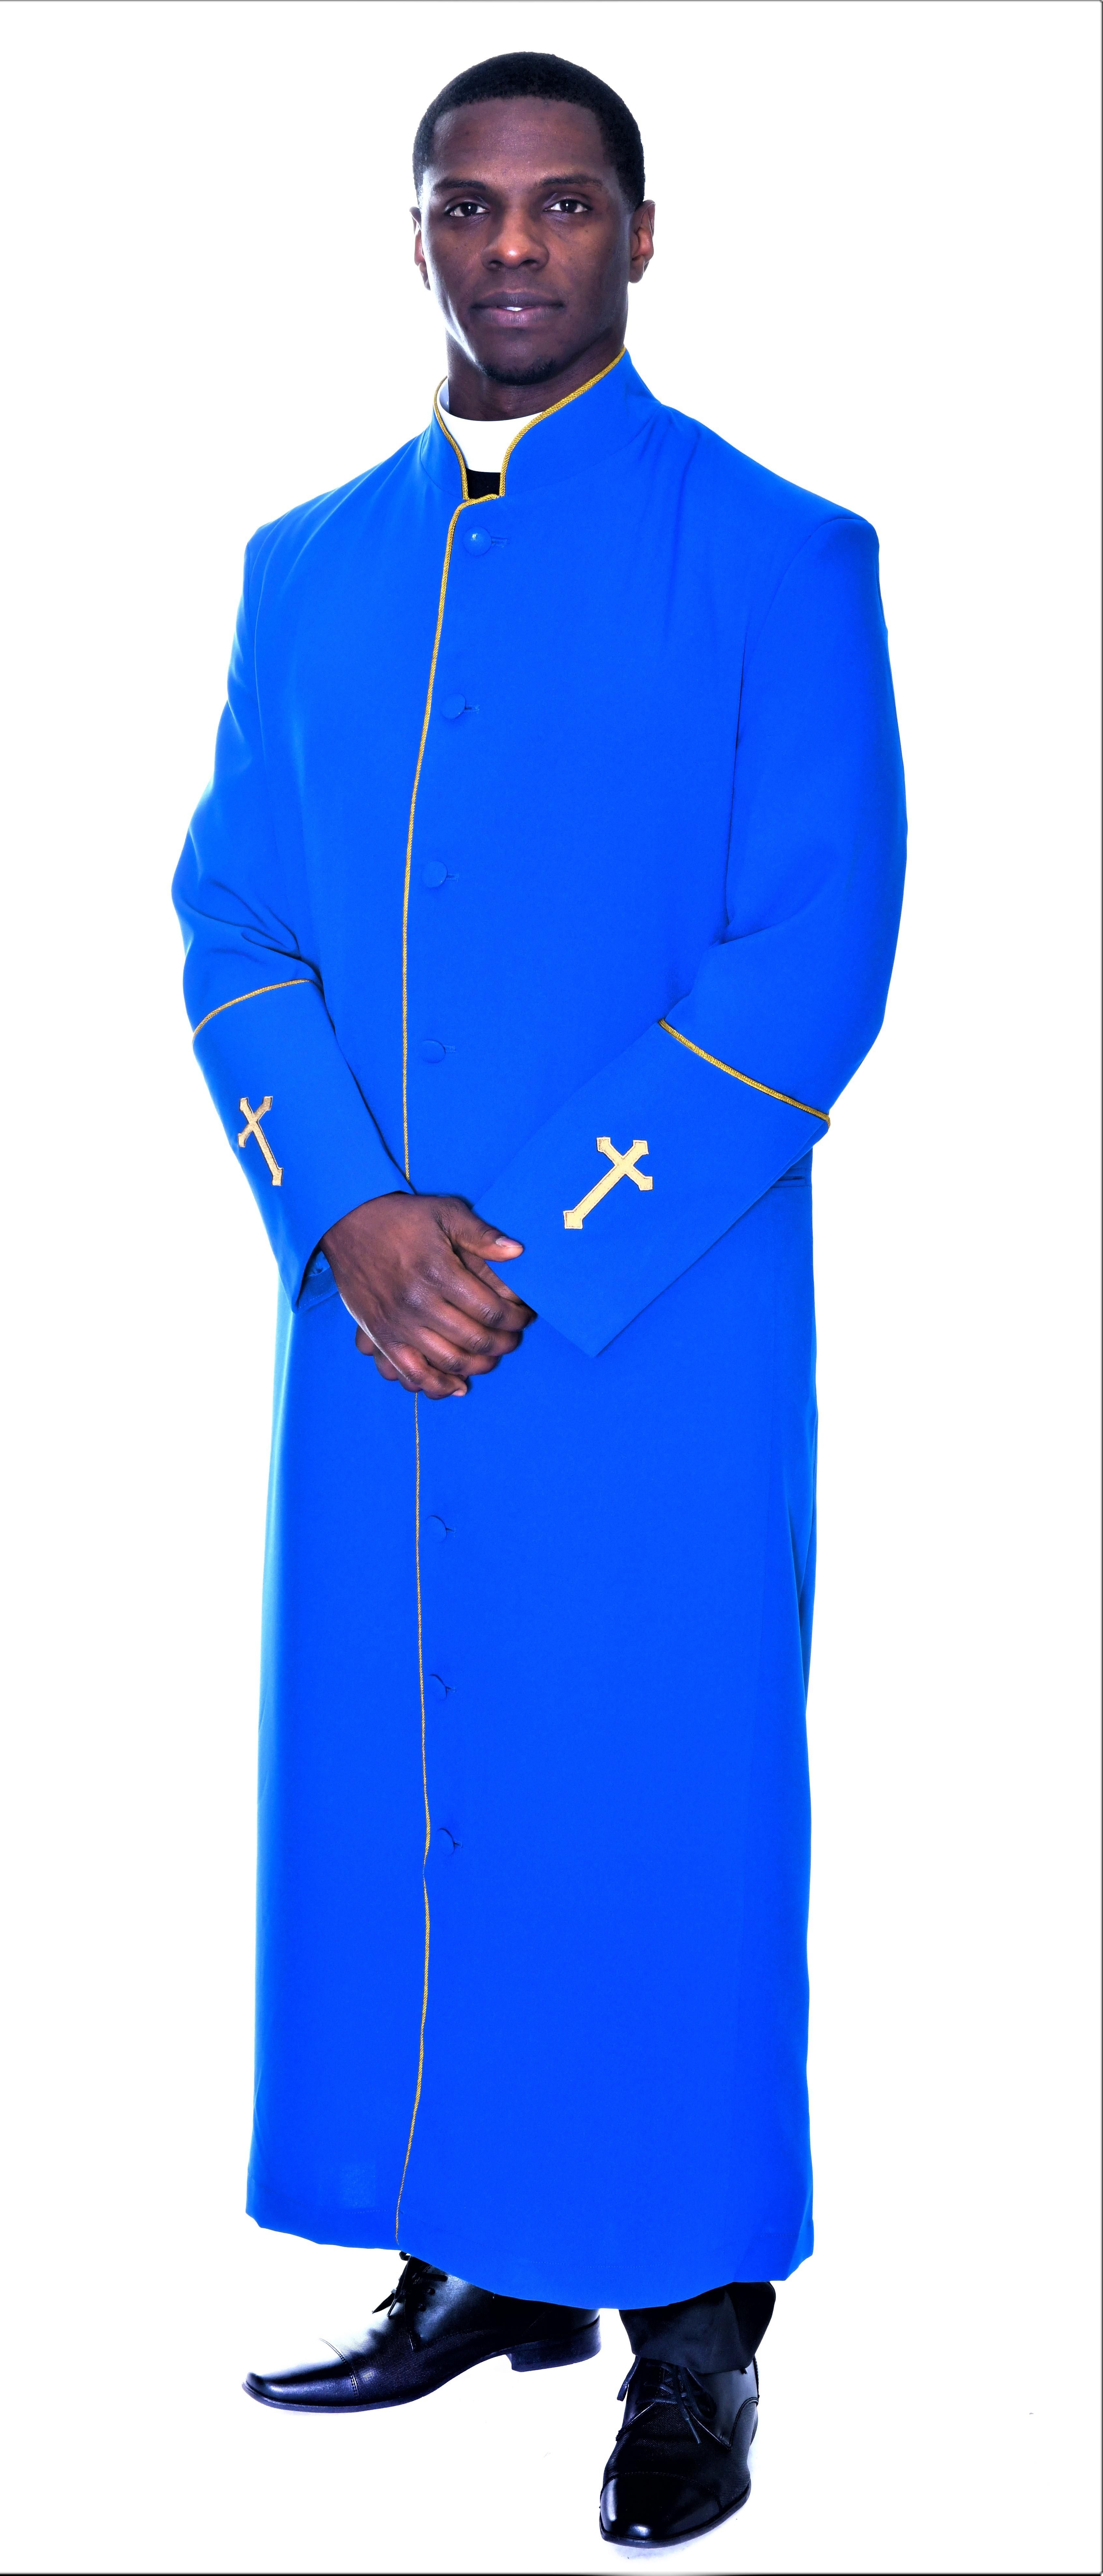 Best Clergy Robes Shirts Church Suits Pastor Preacher Choir Robes